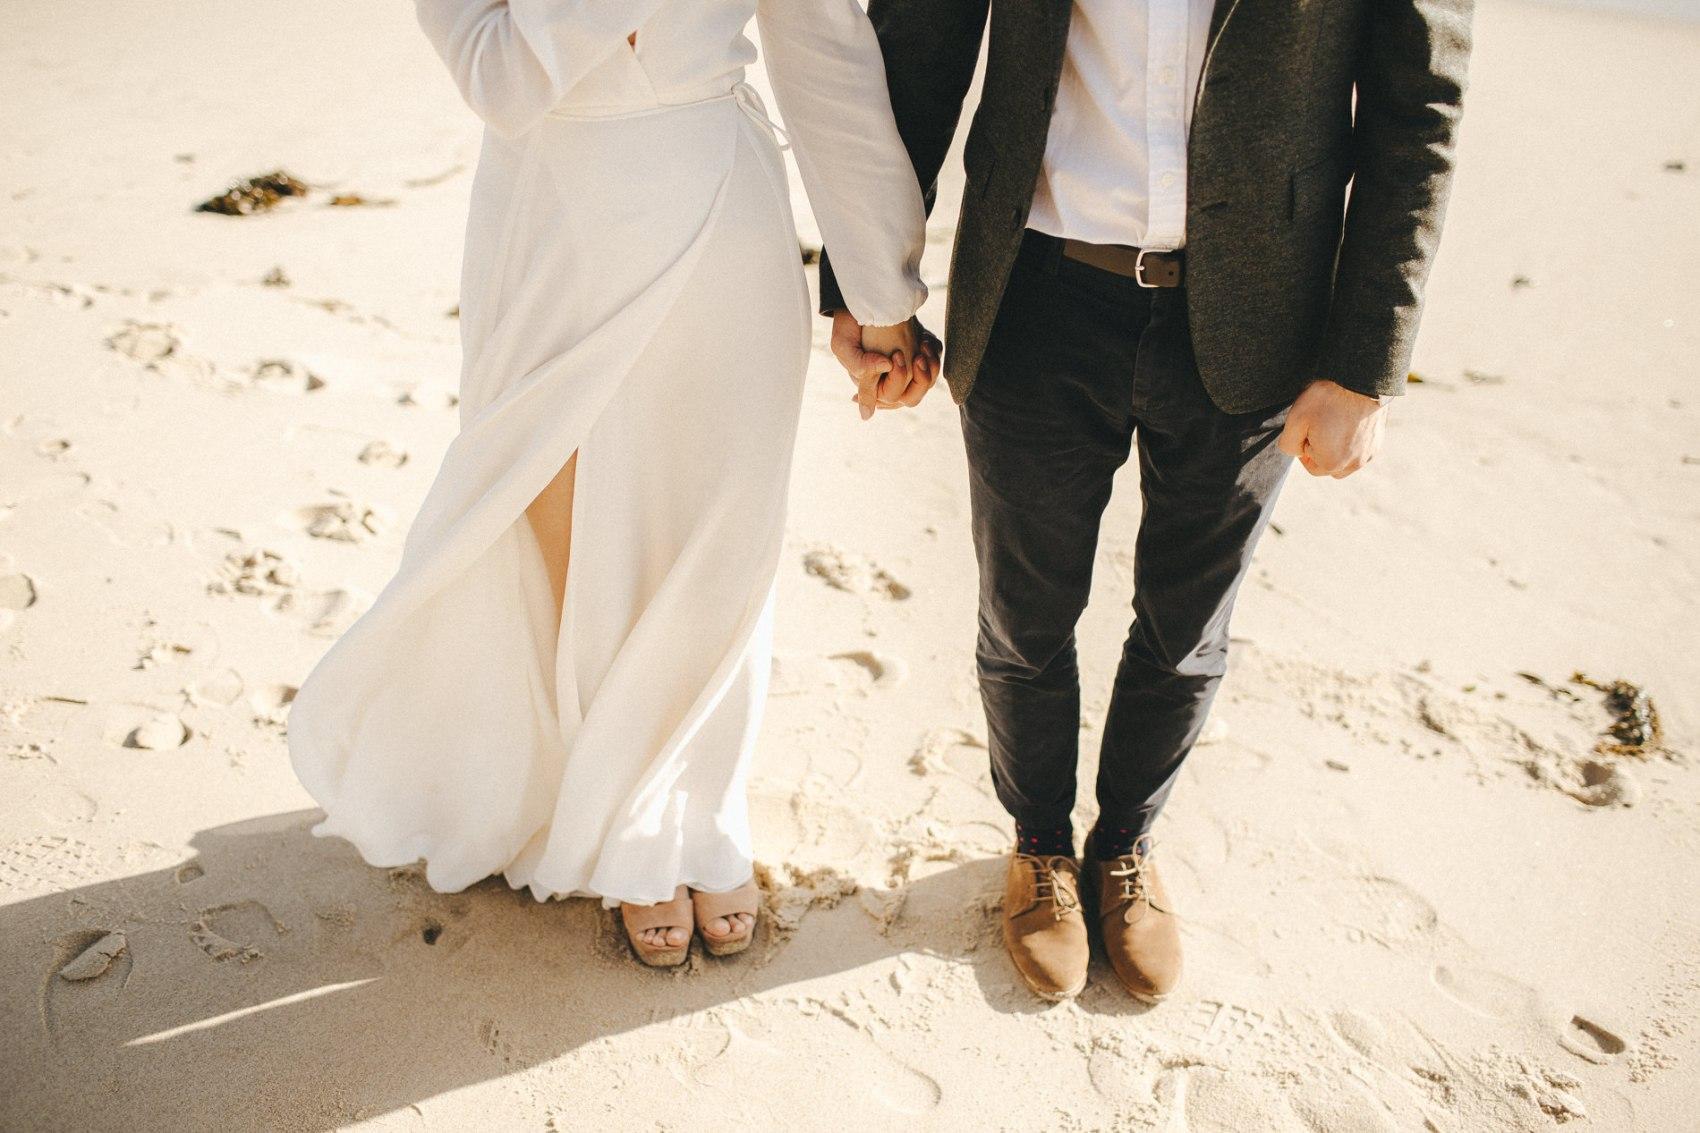 intimate-wedding-la-baule-pouliguen-mariage-104.jpg